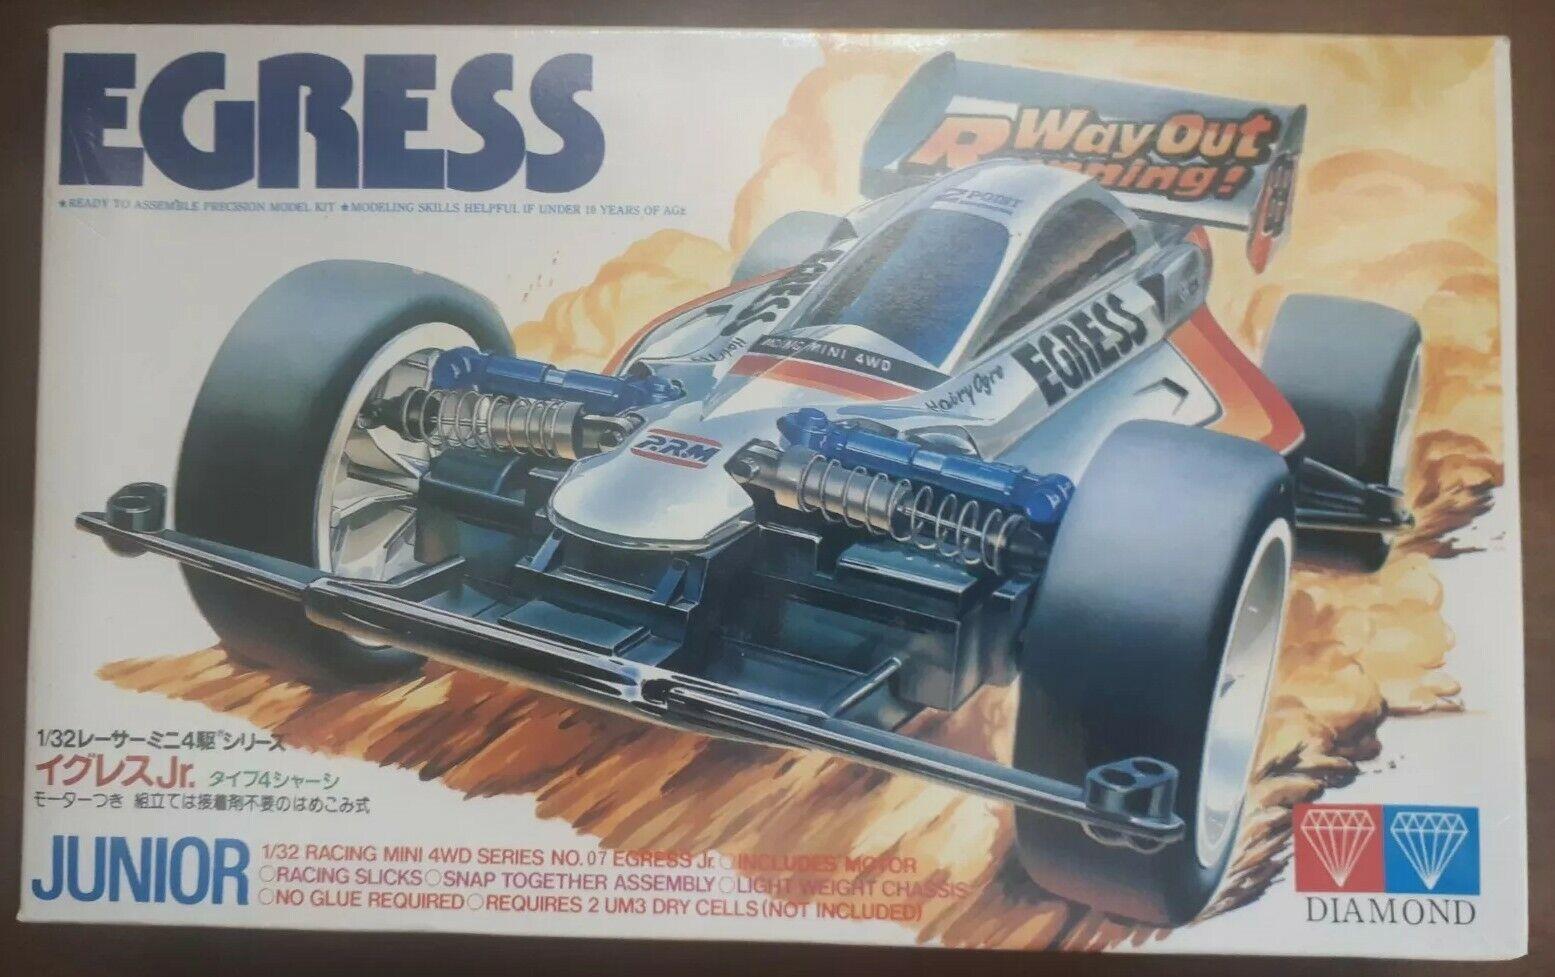 1993 Diamond Egress Junior 1 32 Scale Model no. 07 item. 18013, new, open box